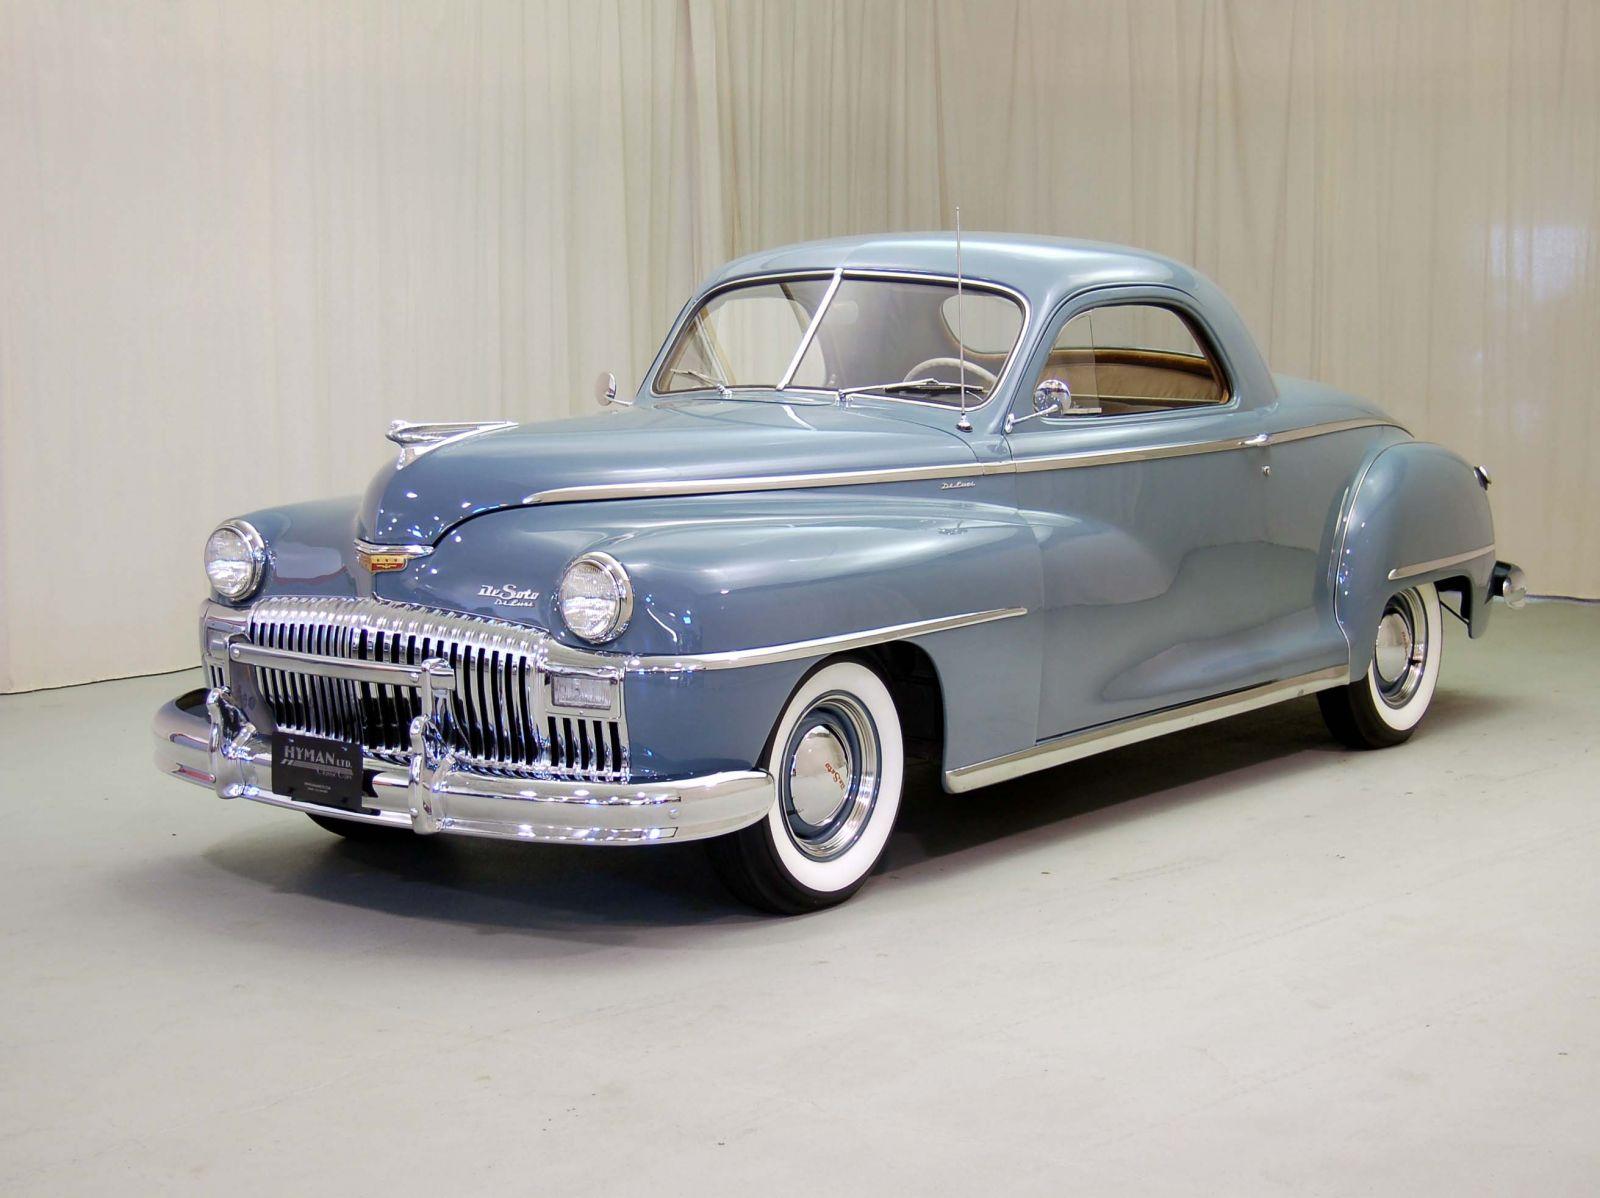 1948 DeSoto Deluxe Classic Car For Sale   Buy 1948 DeSoto Deluxe at Hyman LTD